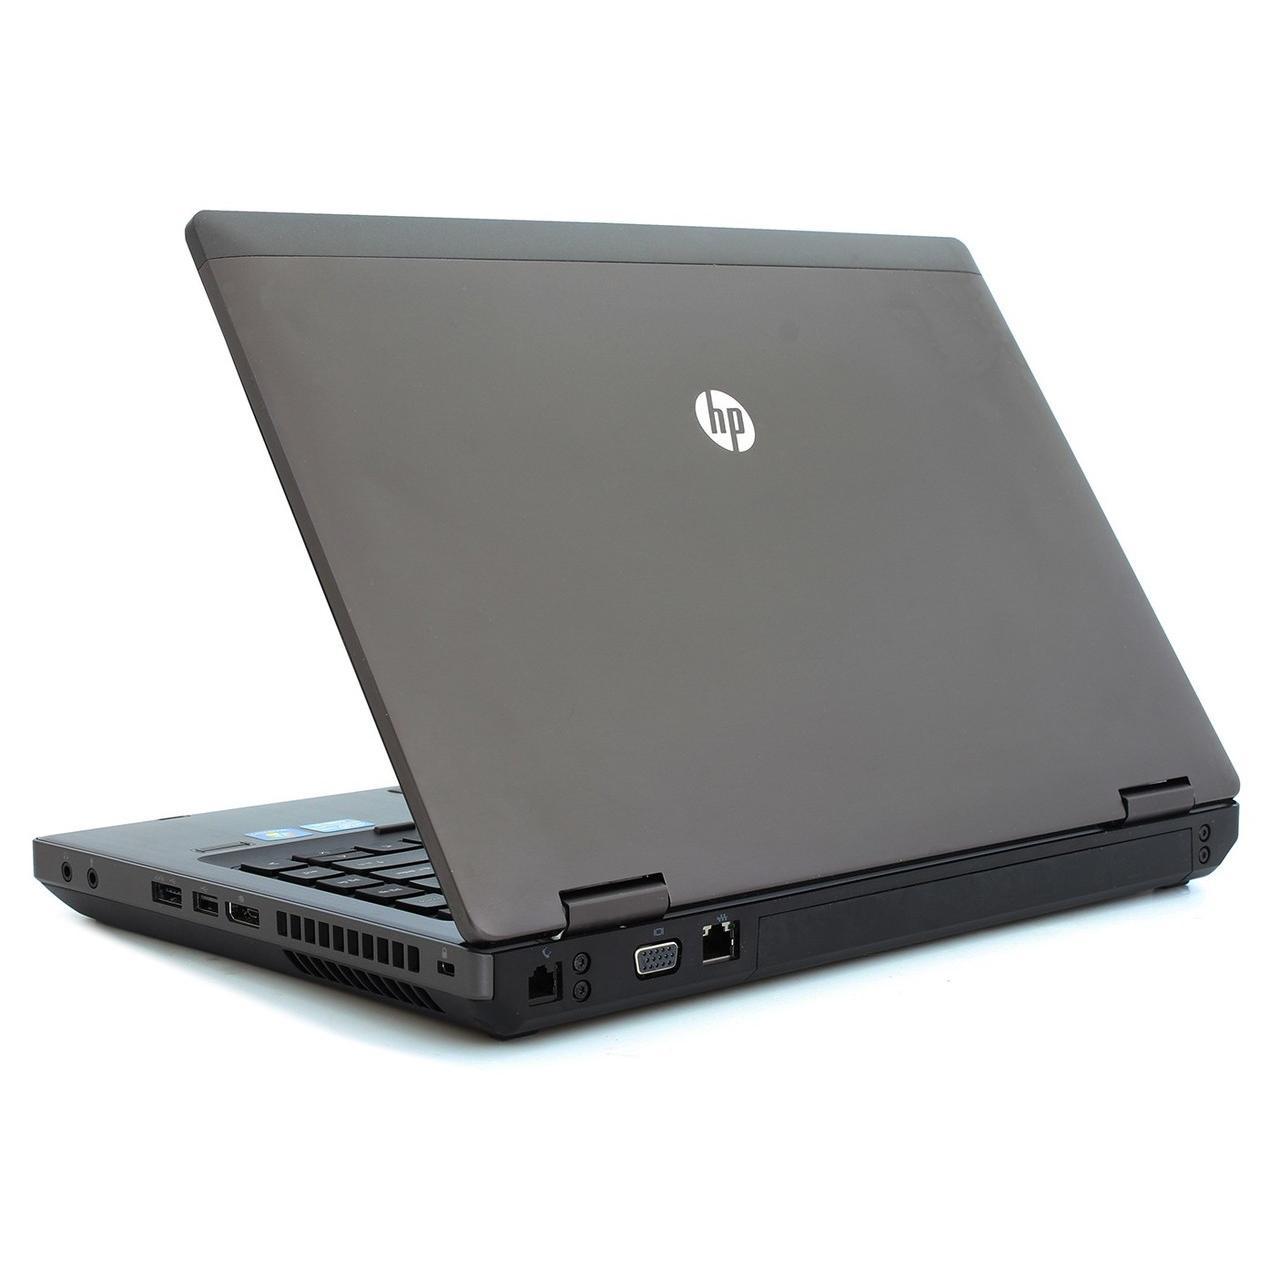 "Hp ProBook 6360b 13"" Core i5 2,3 GHz  - HDD 250 GB - 4GB Tastiera Francese"